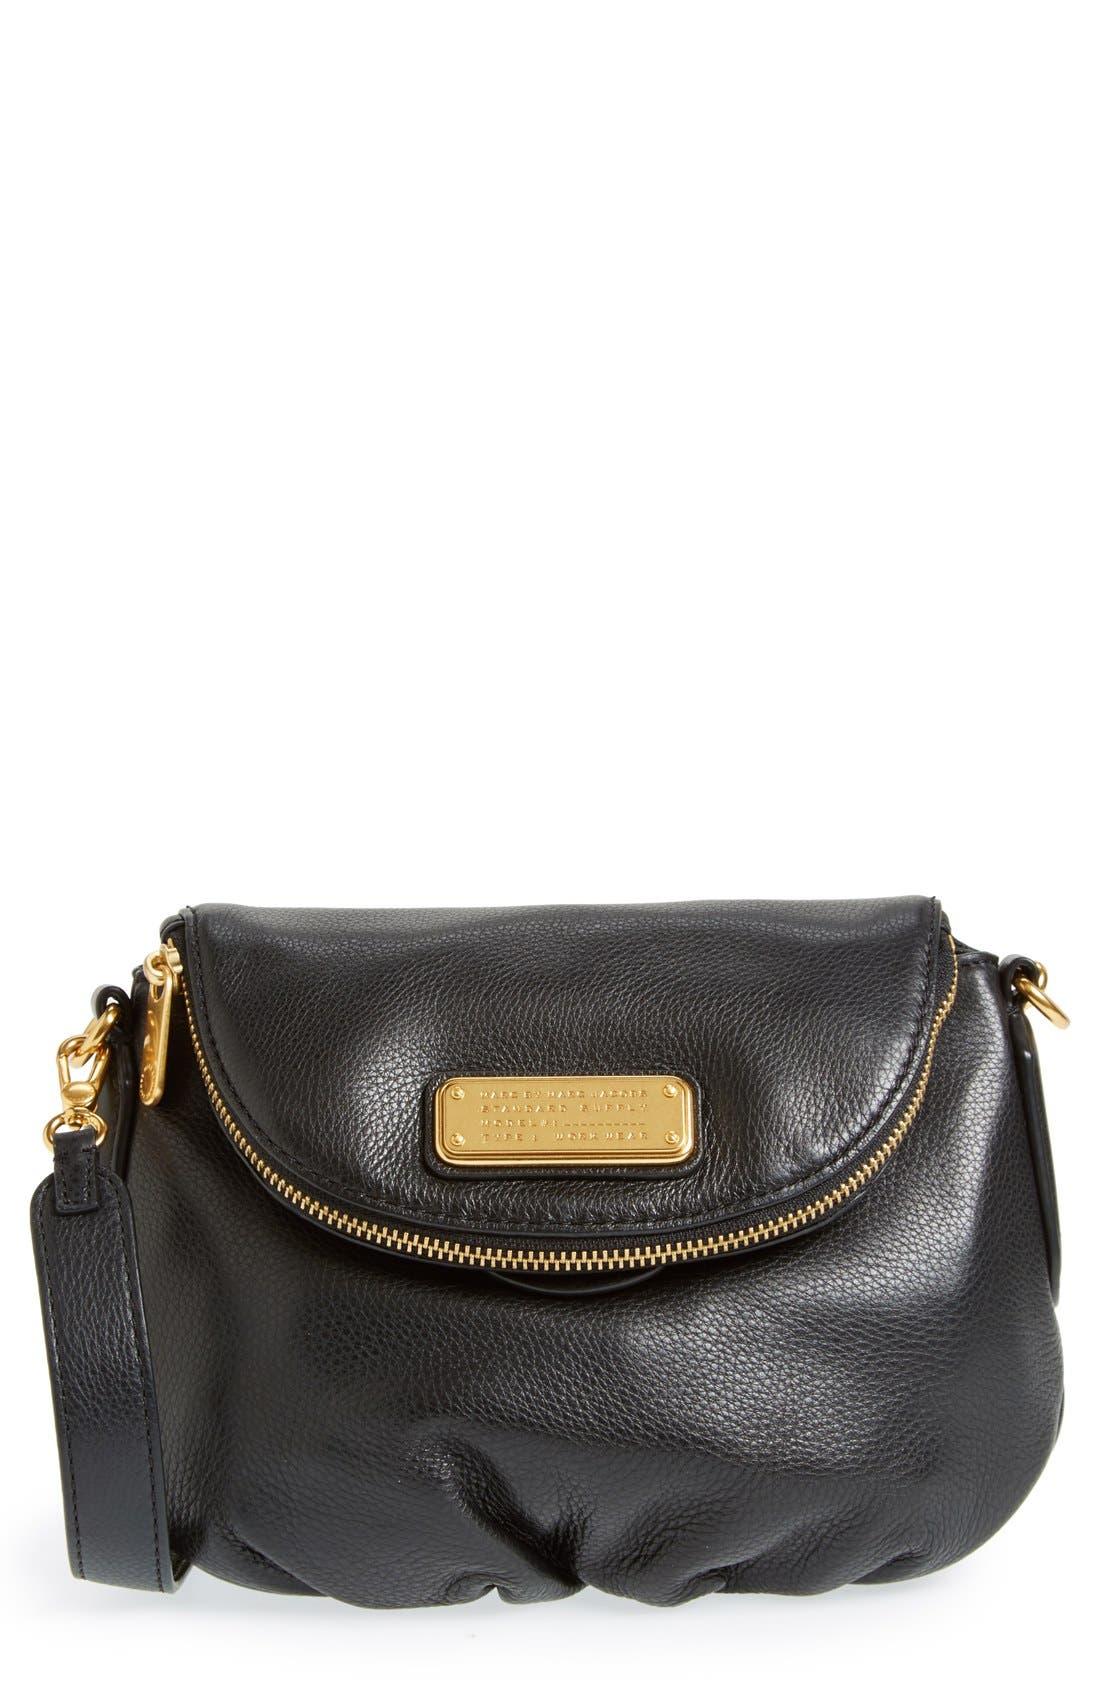 MARC BY MARC JACOBS 'New Q - Mini Natasha' Crossbody Bag,                         Main,                         color, 001